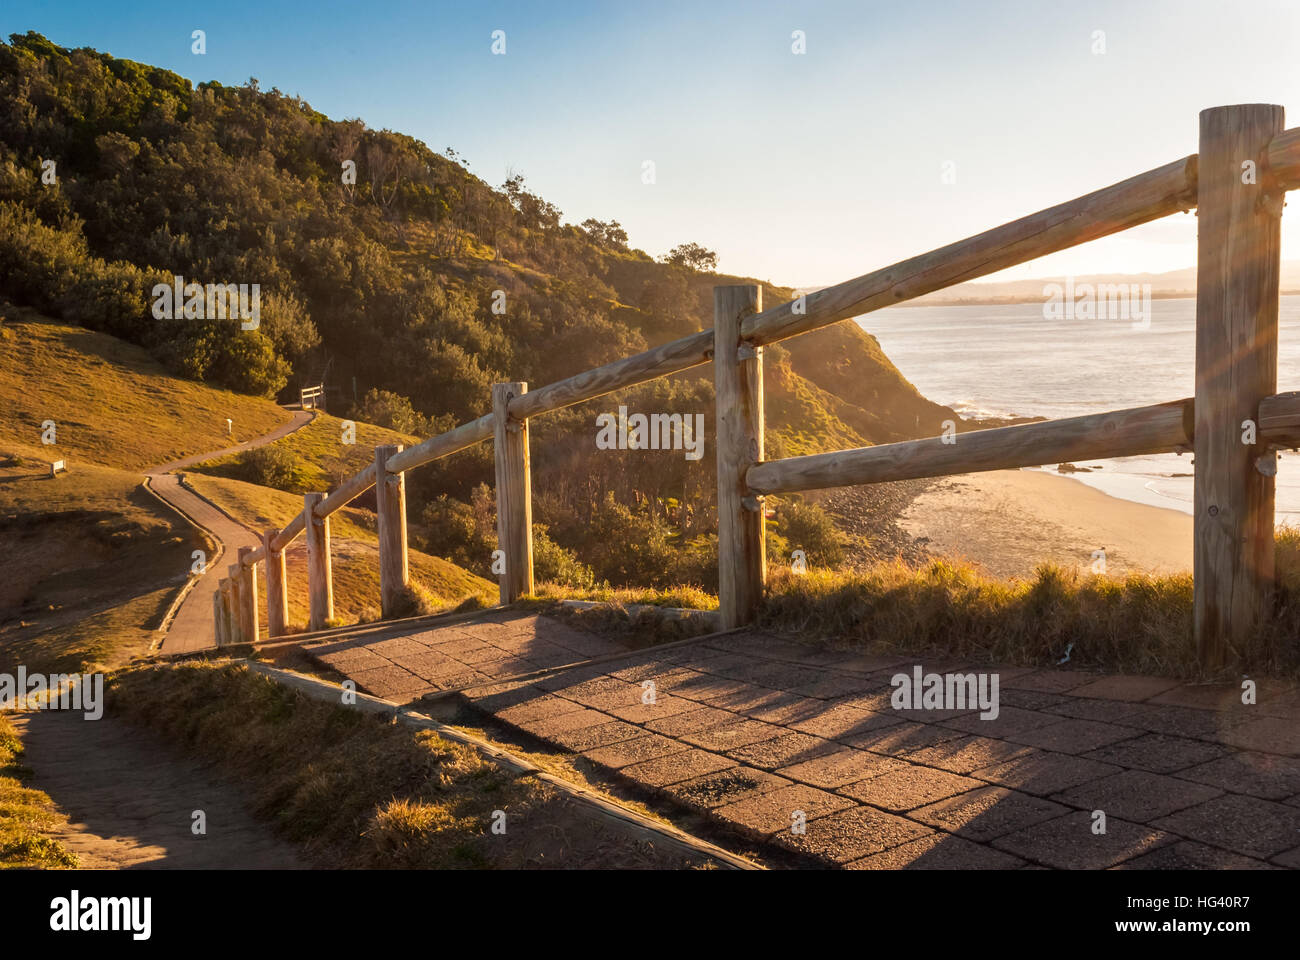 Byron Bay at sunset, Australia - Stock Image